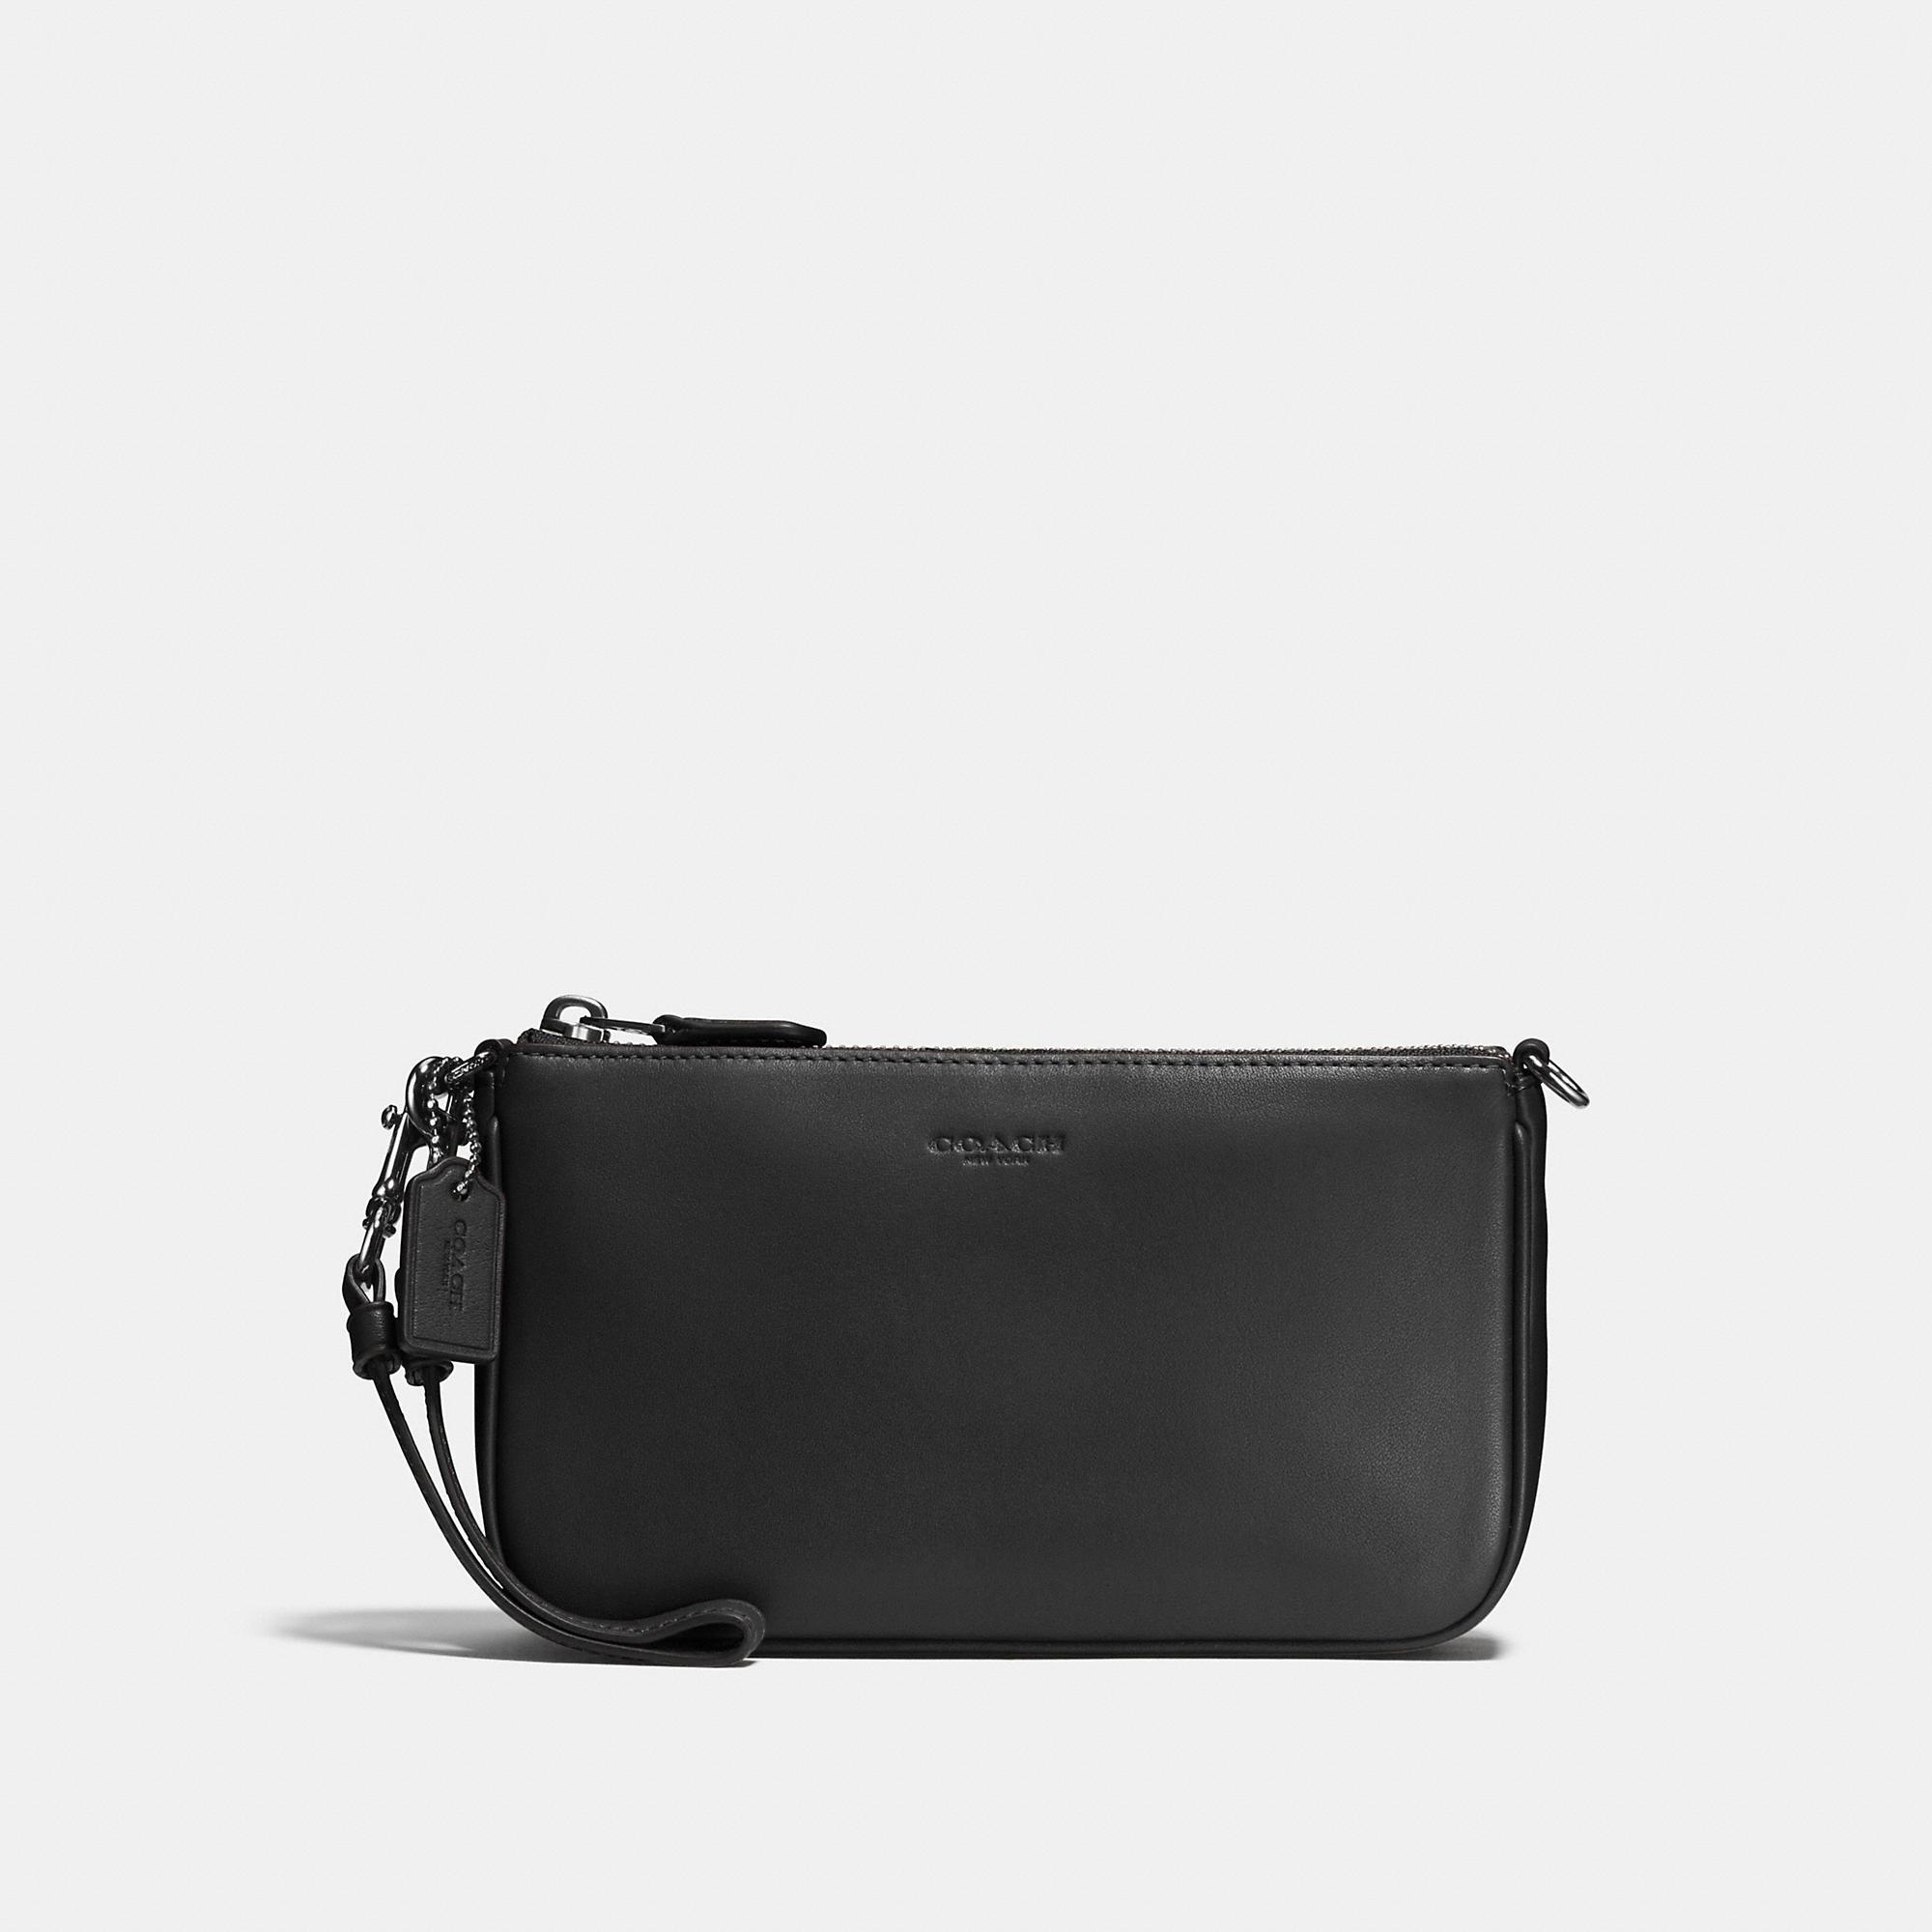 Coach Nolita Wristlet 19 In Glovetanned Leather